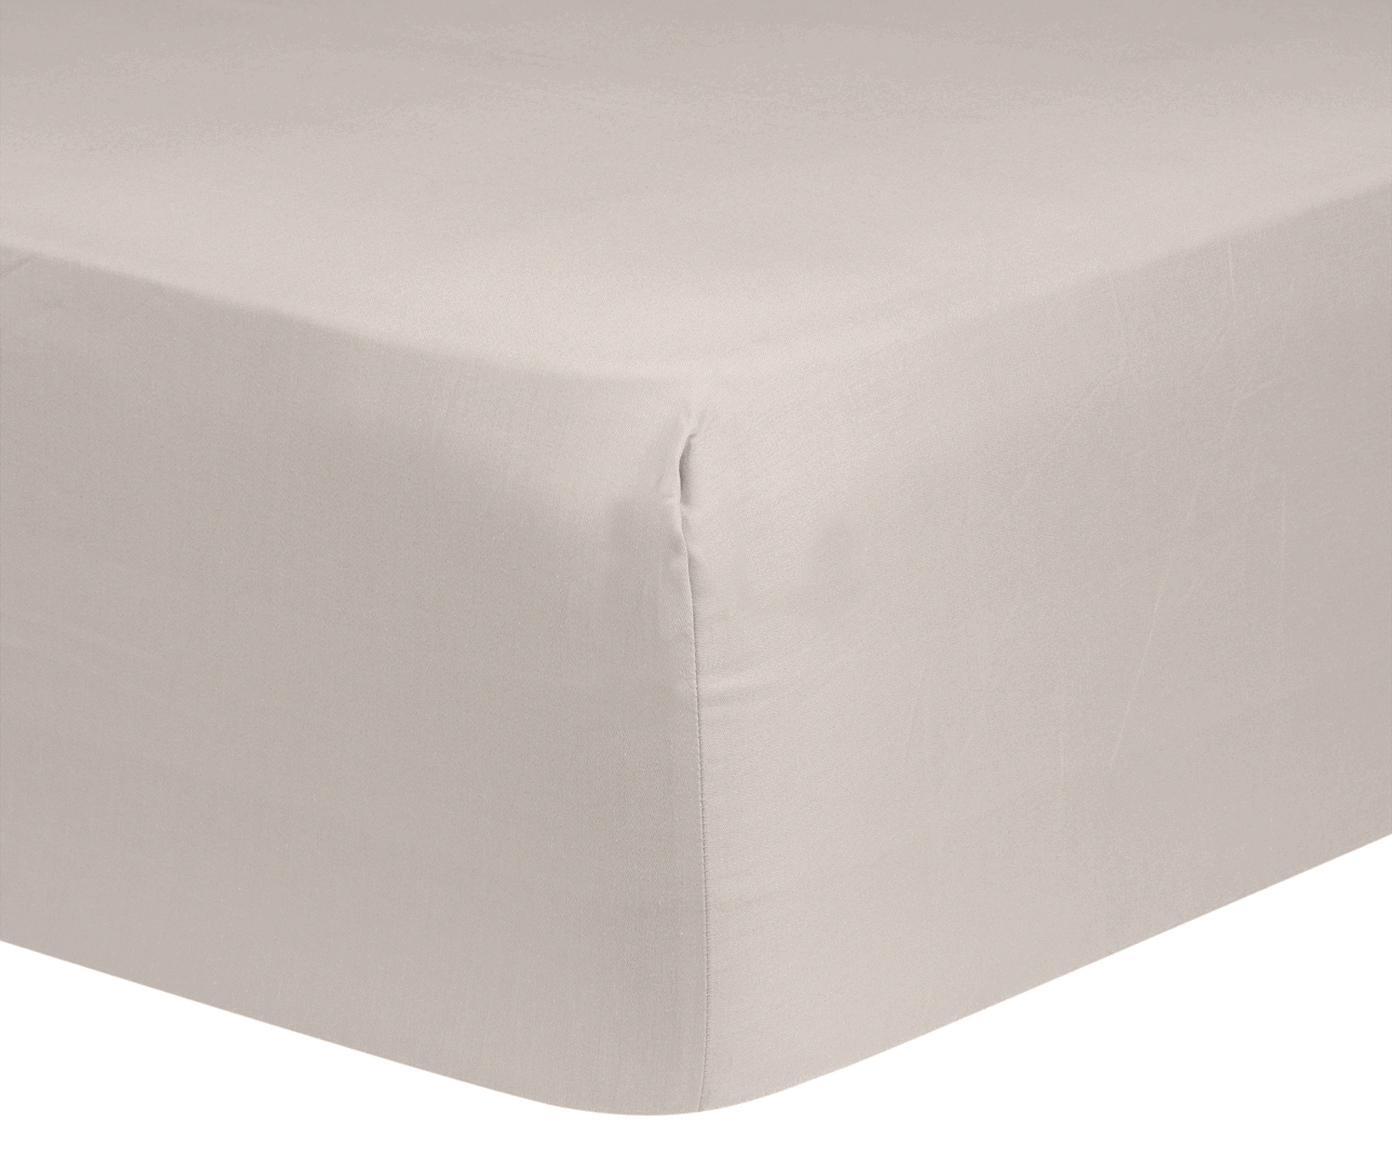 Sábana bajera de satén Comfort, Gris pardo, Cama 90 cm (90 x 200 cm)